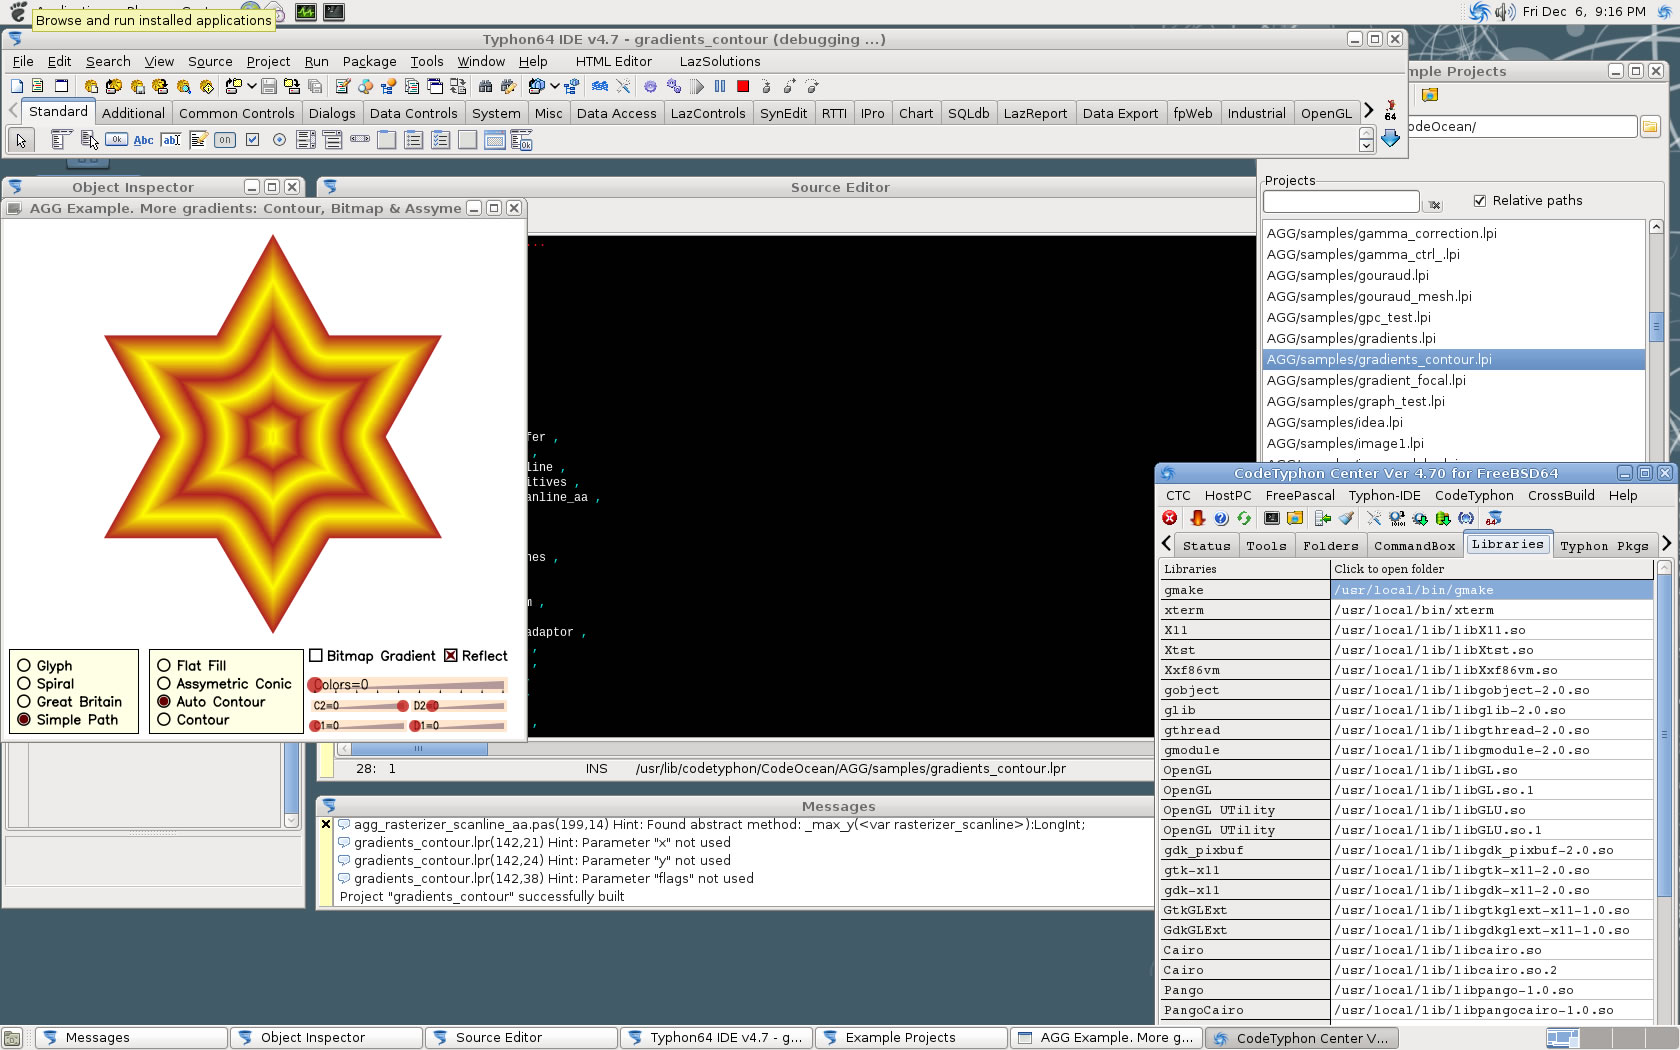 FreeBSD64-11.jpg